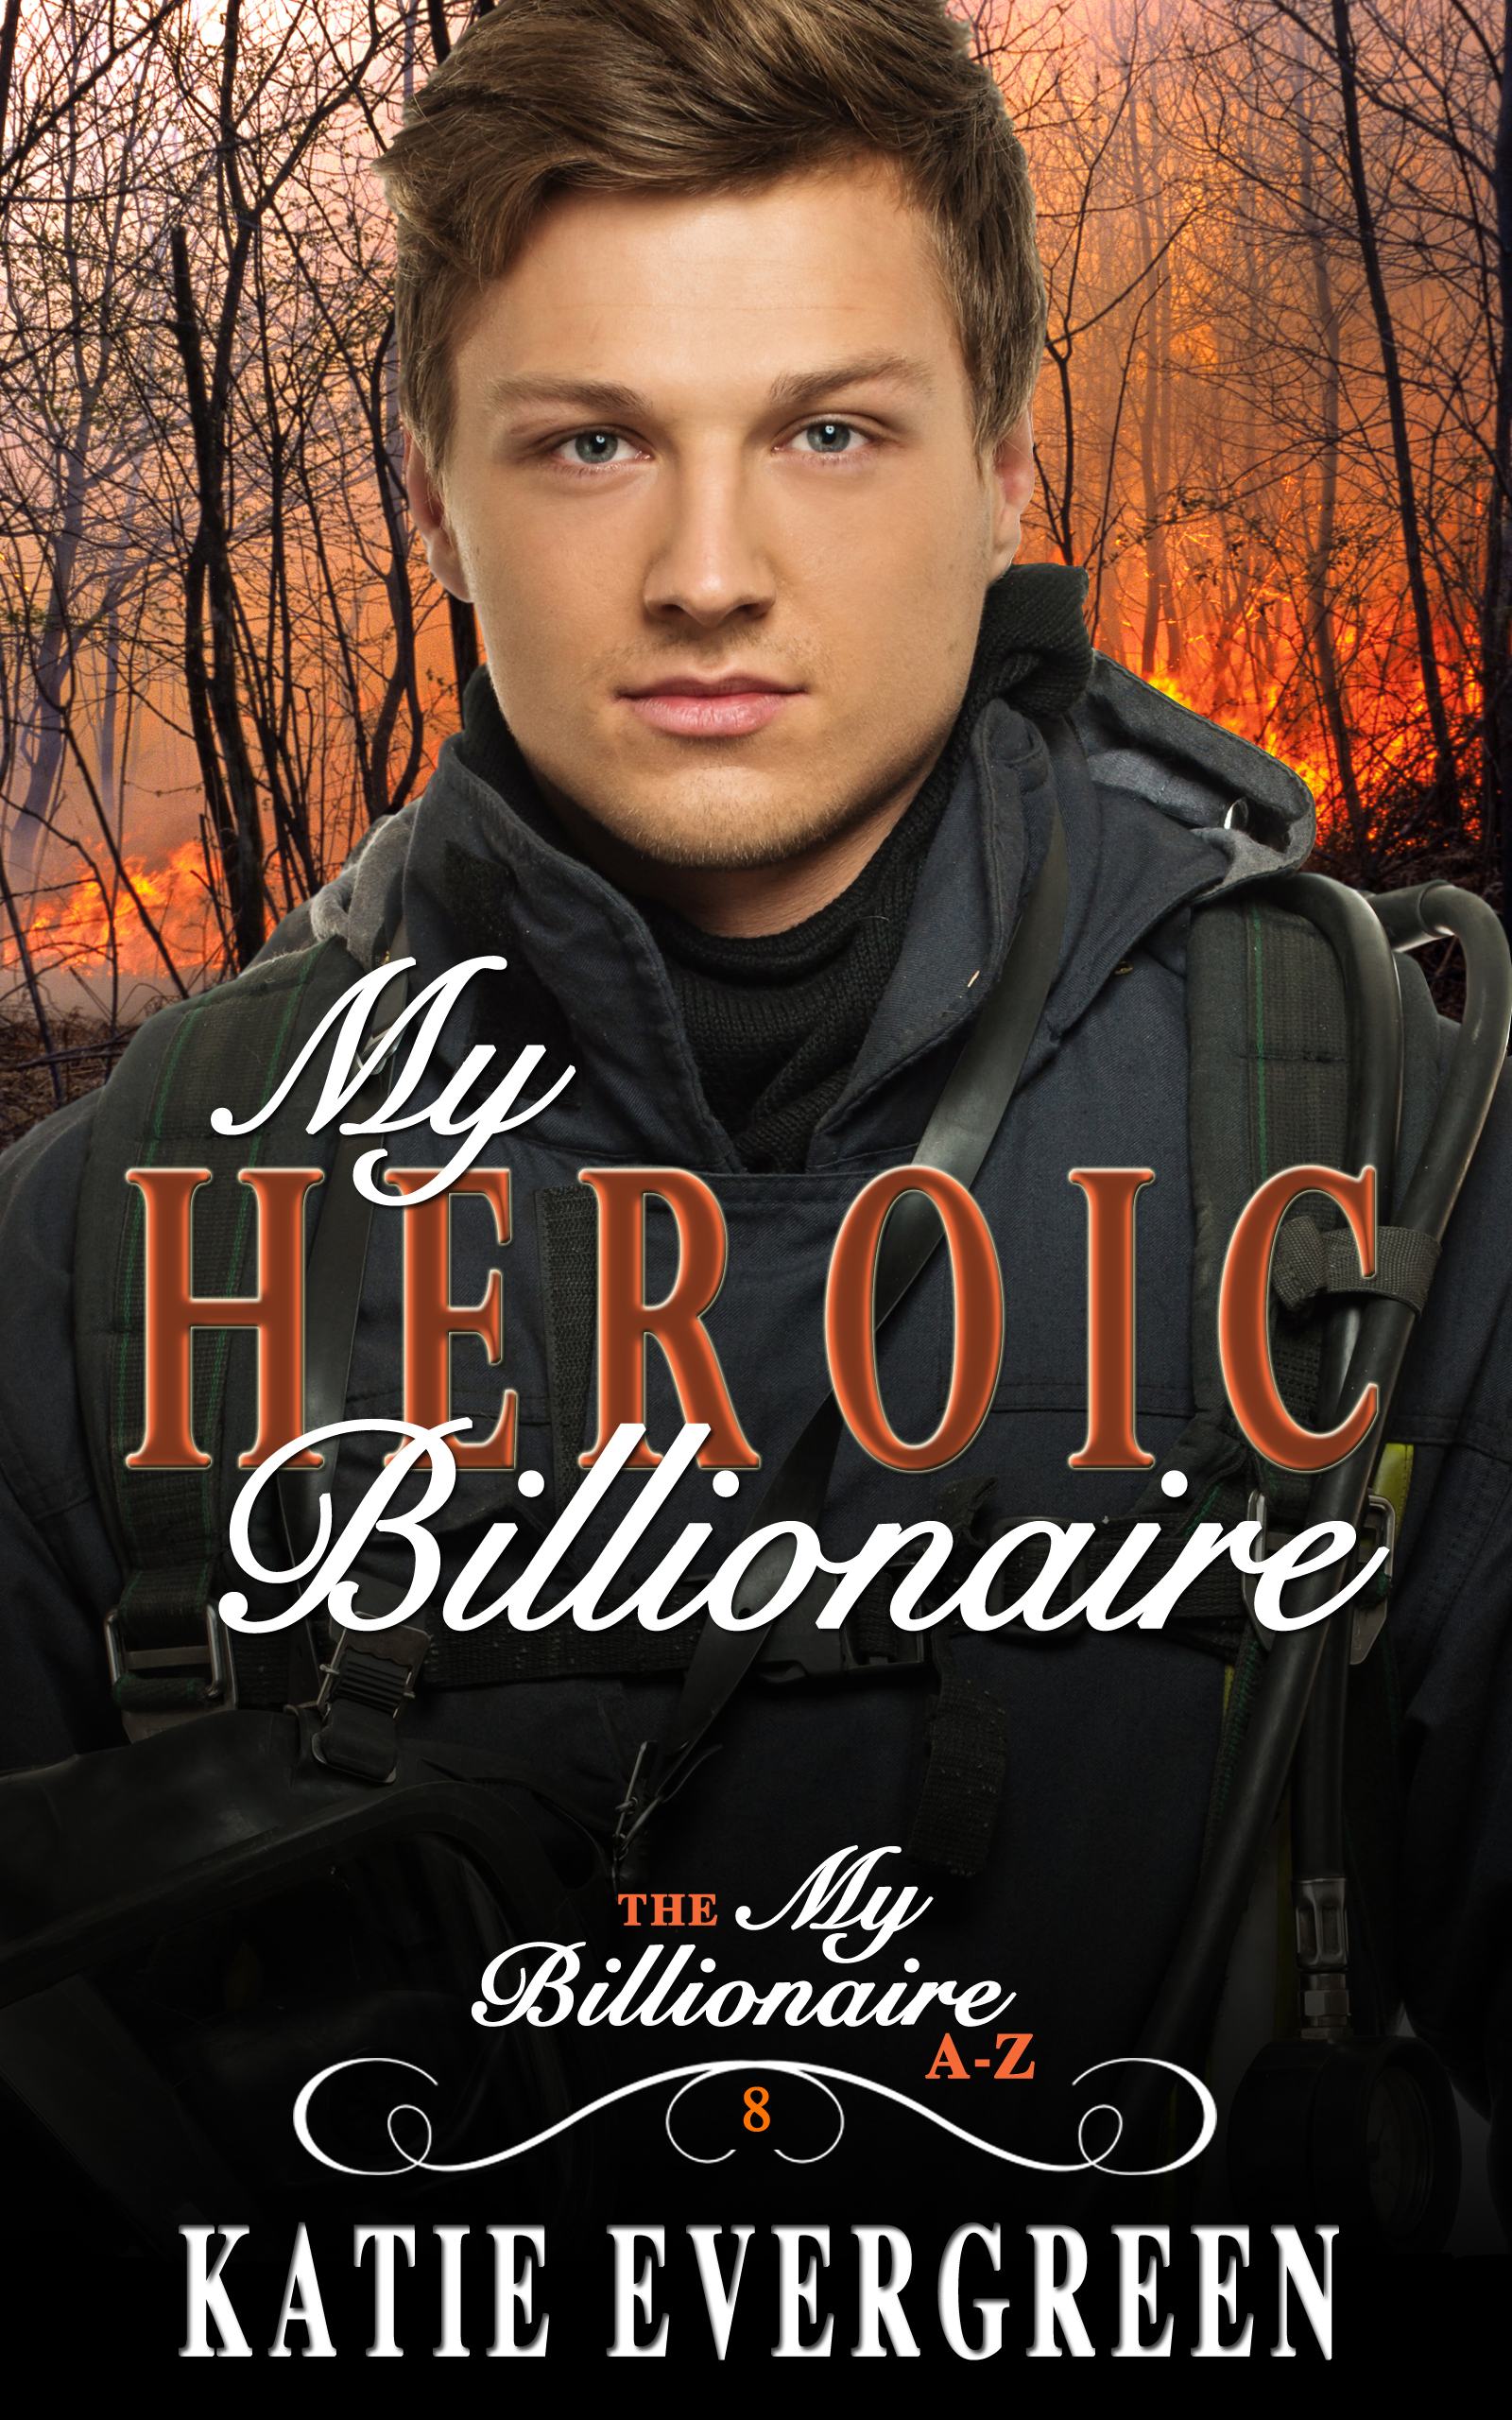 My Heroic Billionaire - Coming soon…